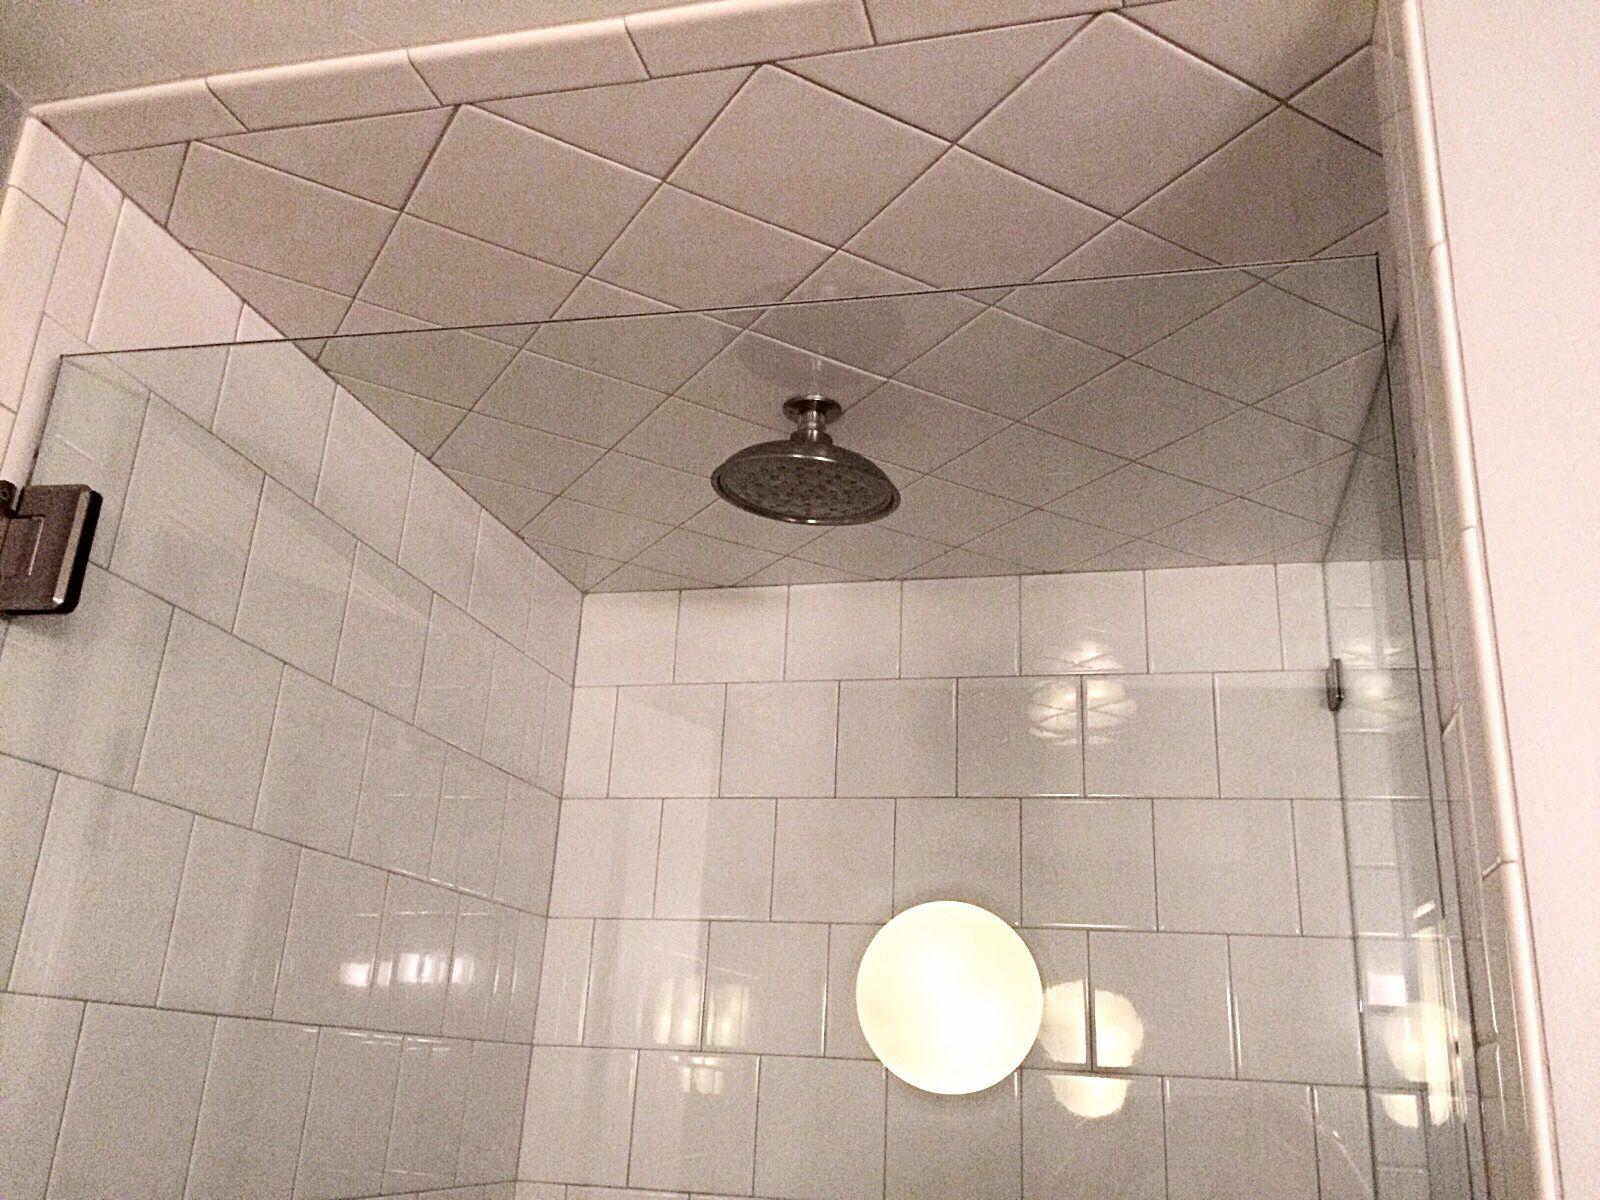 Custom 4x4 Subway Tile Walls With Diamond Subway Pattern On Ceiling